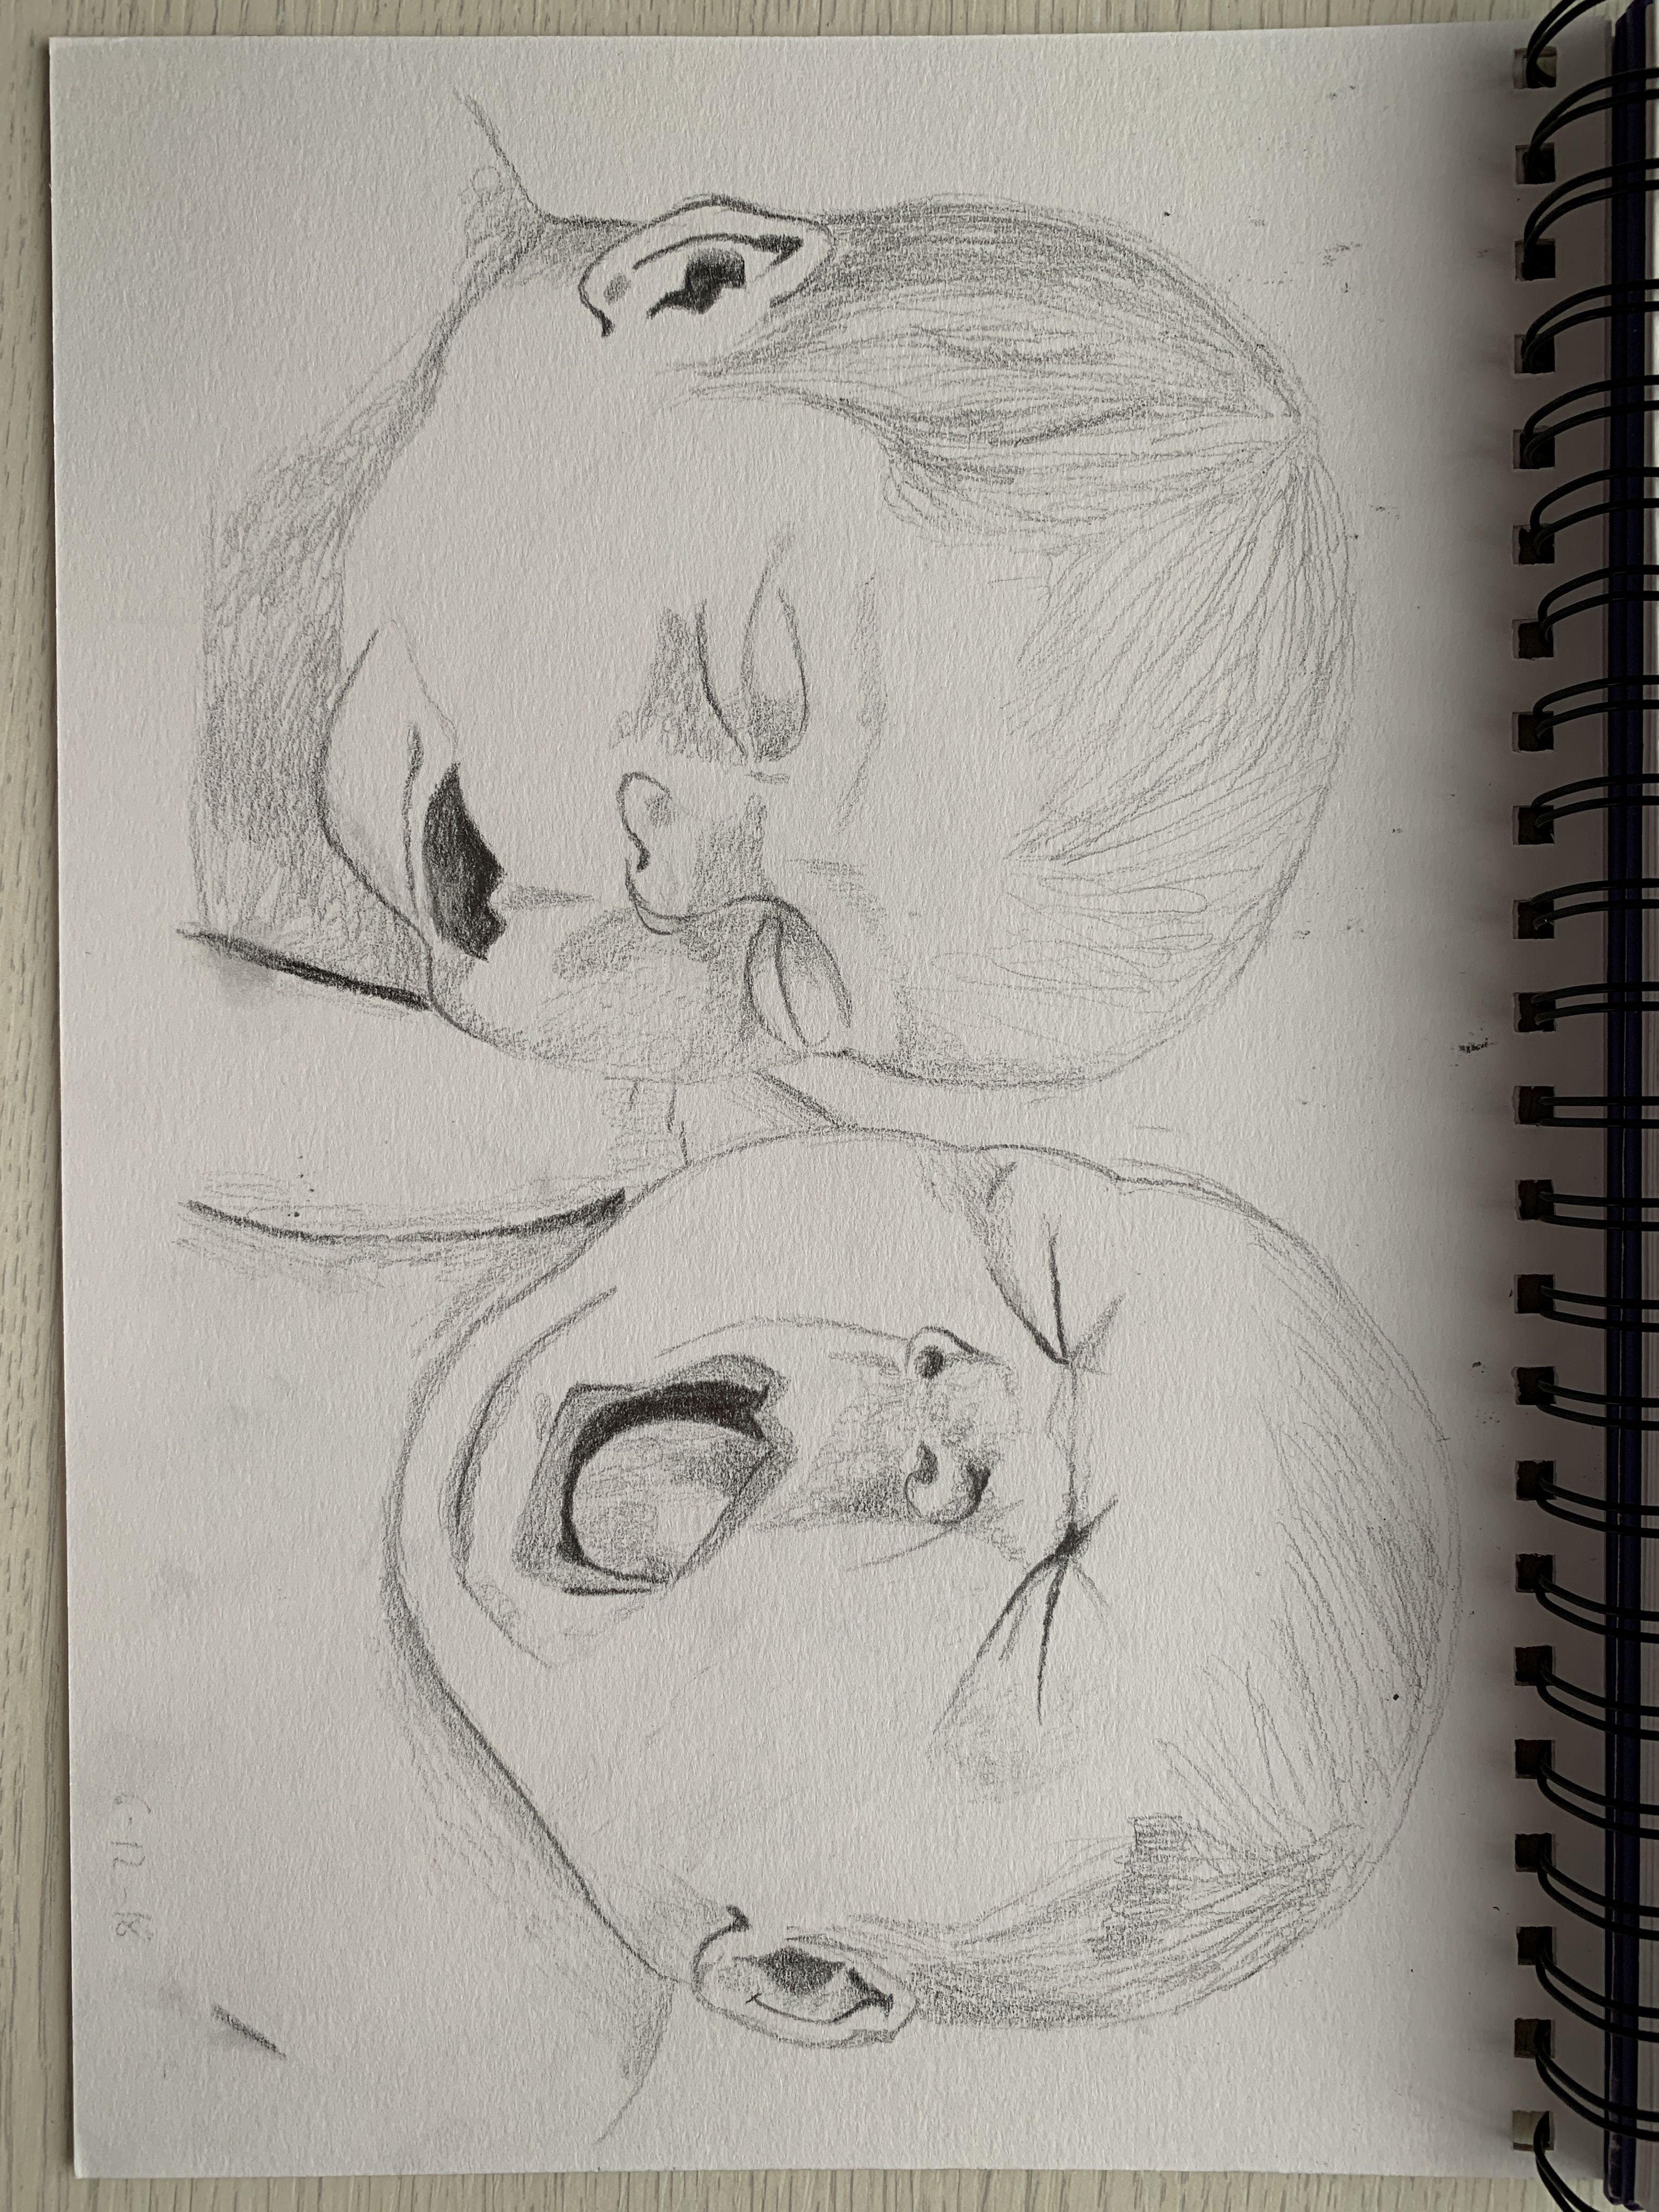 Dibujo A Lápiz Fácil De Niños Bebés Female Sketch Male Sketch Art